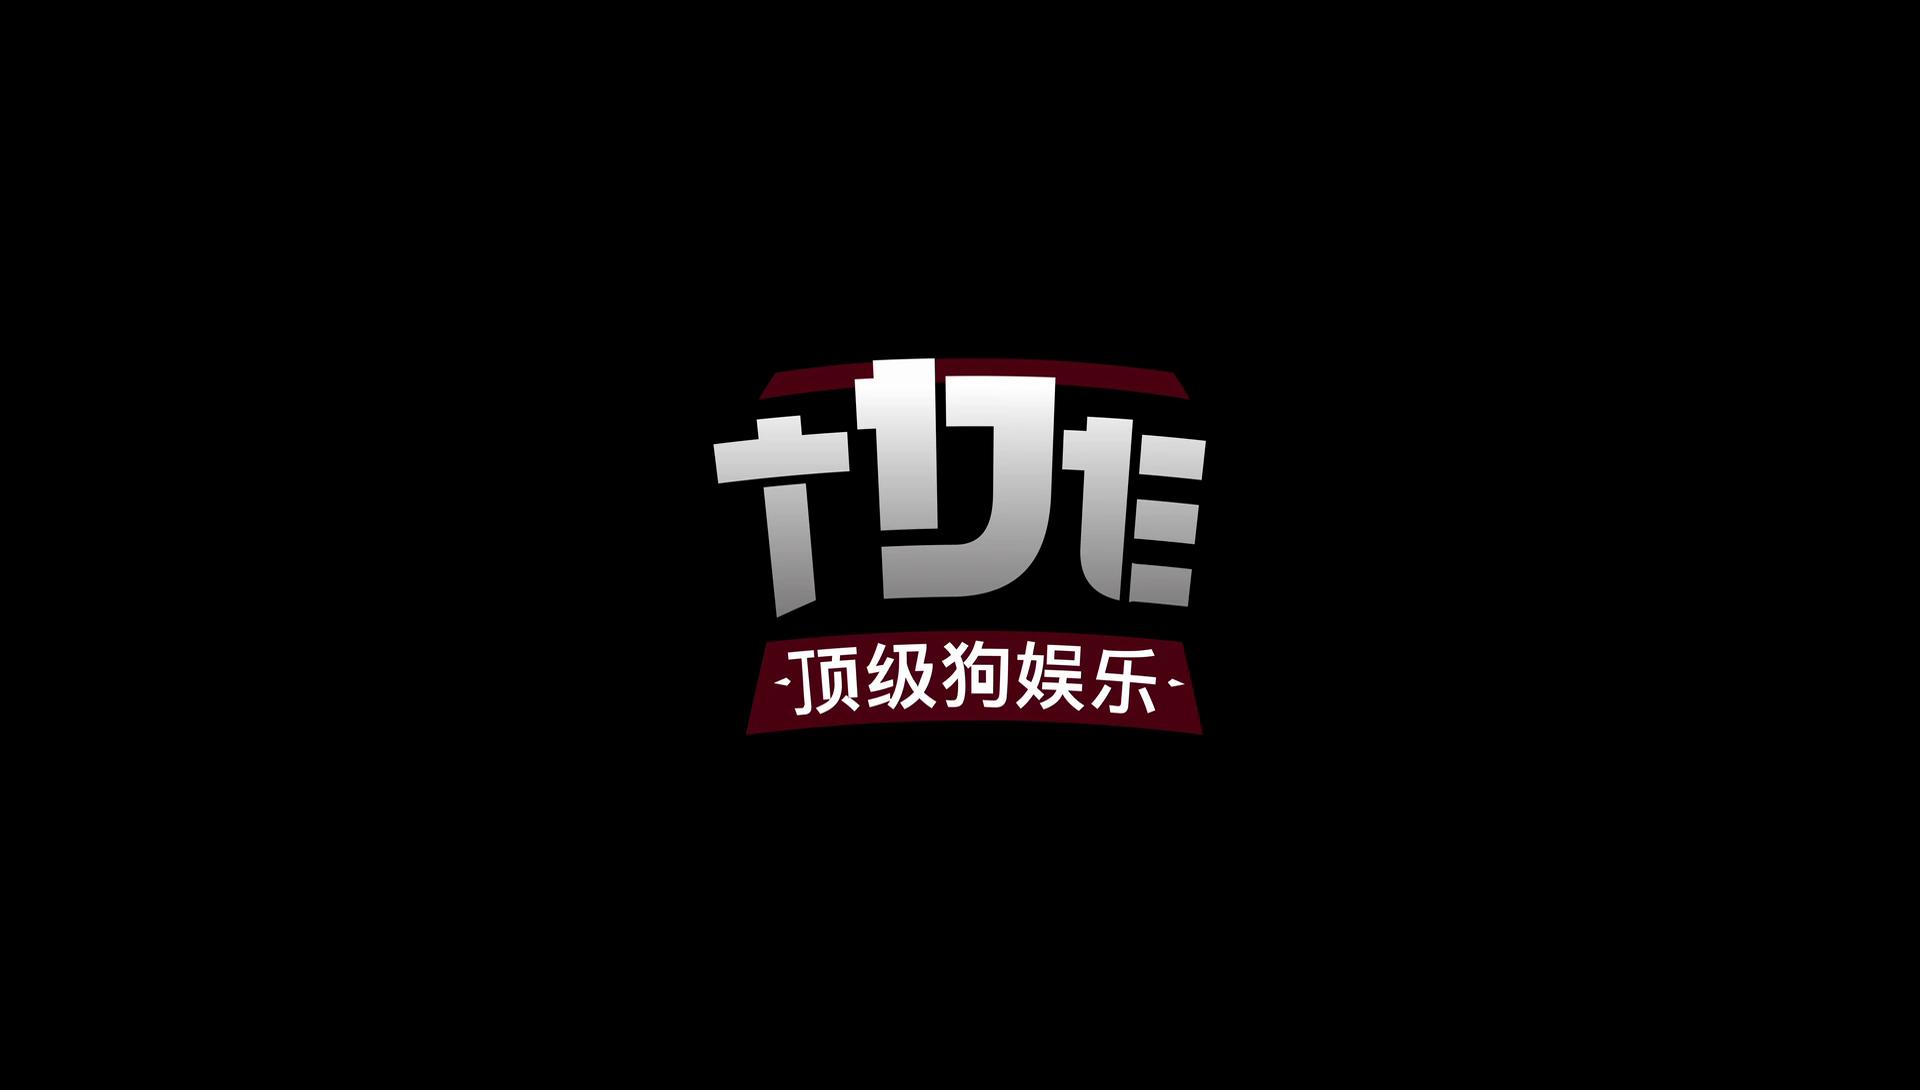 New TDE Logo : HipHopImages.